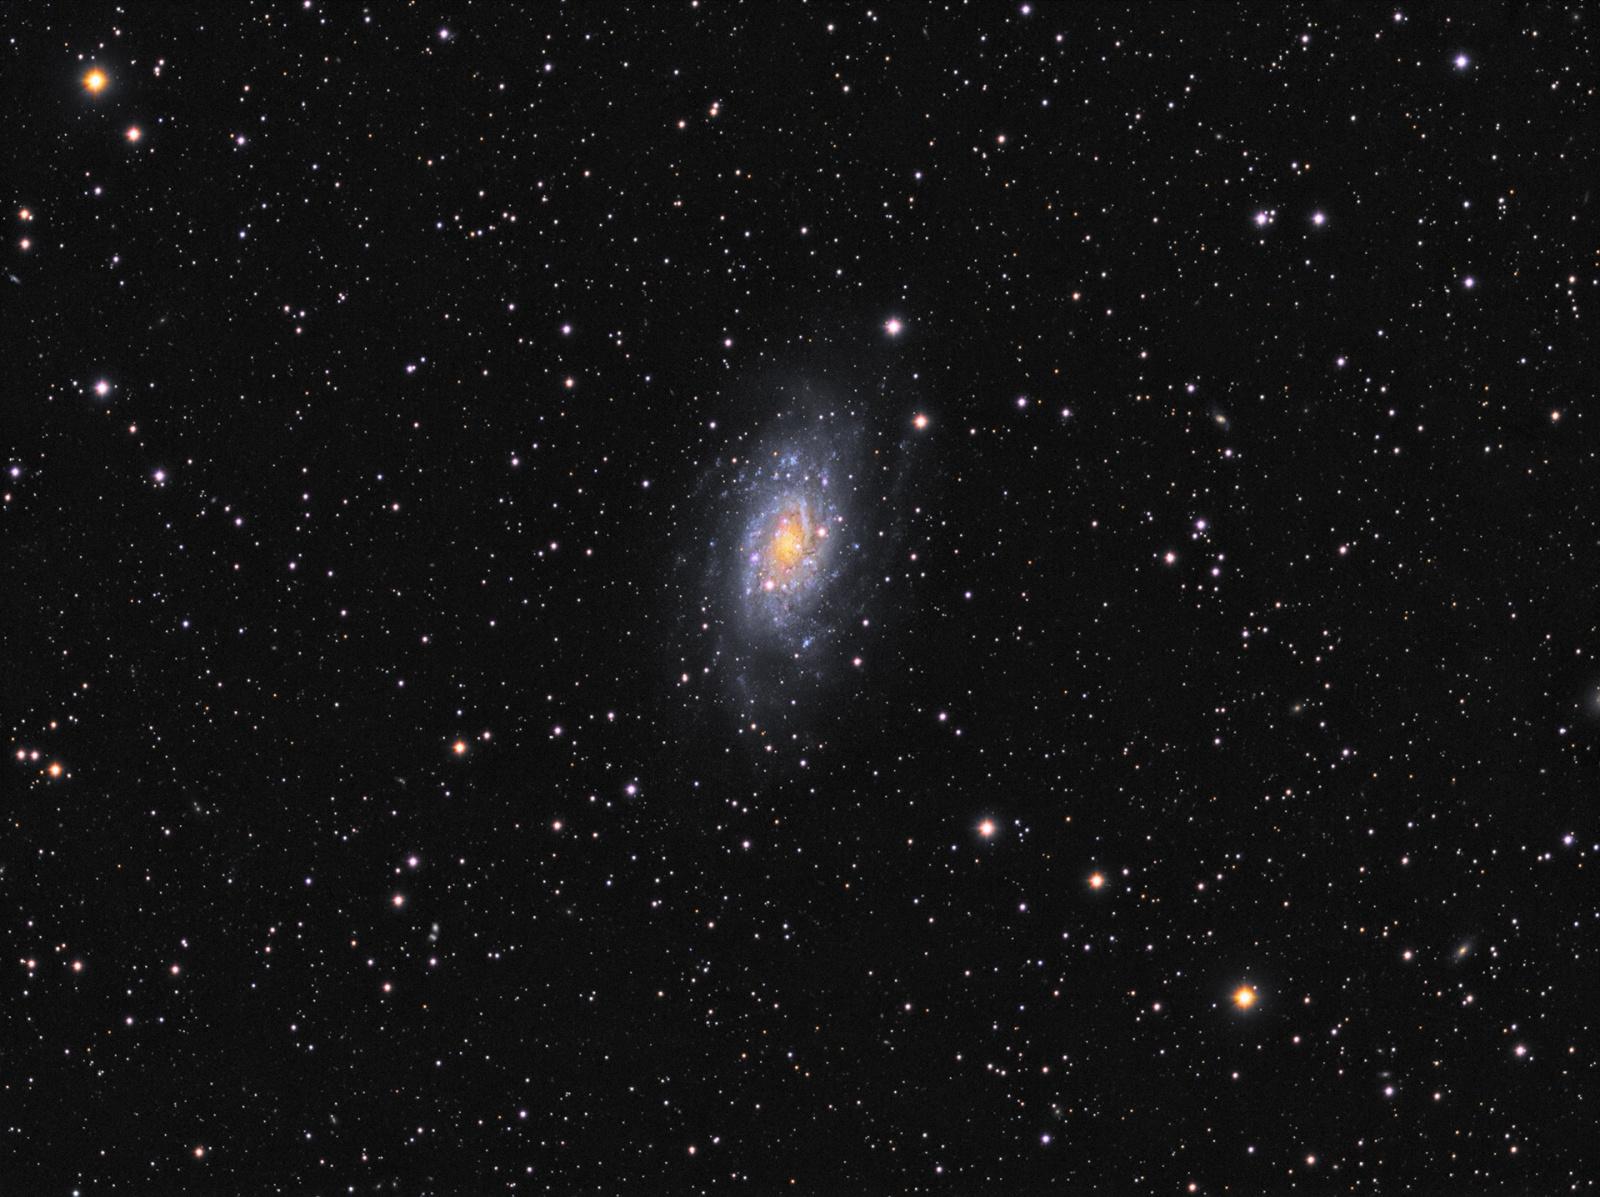 !Final_NGC2403_LRGB_FIXbckgr_noMagenta_1920px.jpg